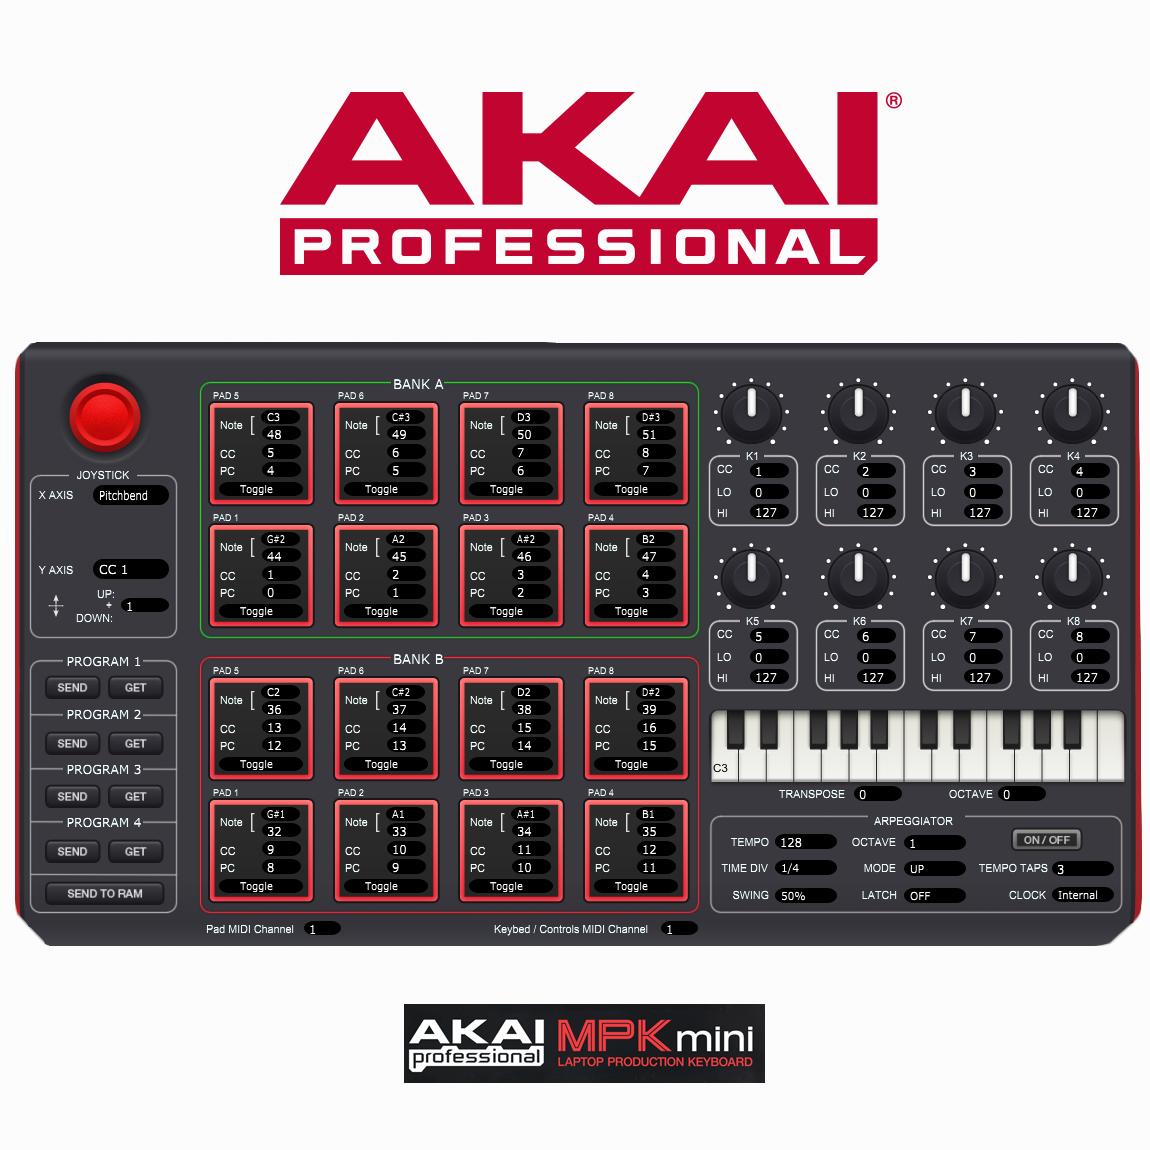 akai professional mpk mini mkii 25 key ultra portable usb midi drum pad and keyboard. Black Bedroom Furniture Sets. Home Design Ideas